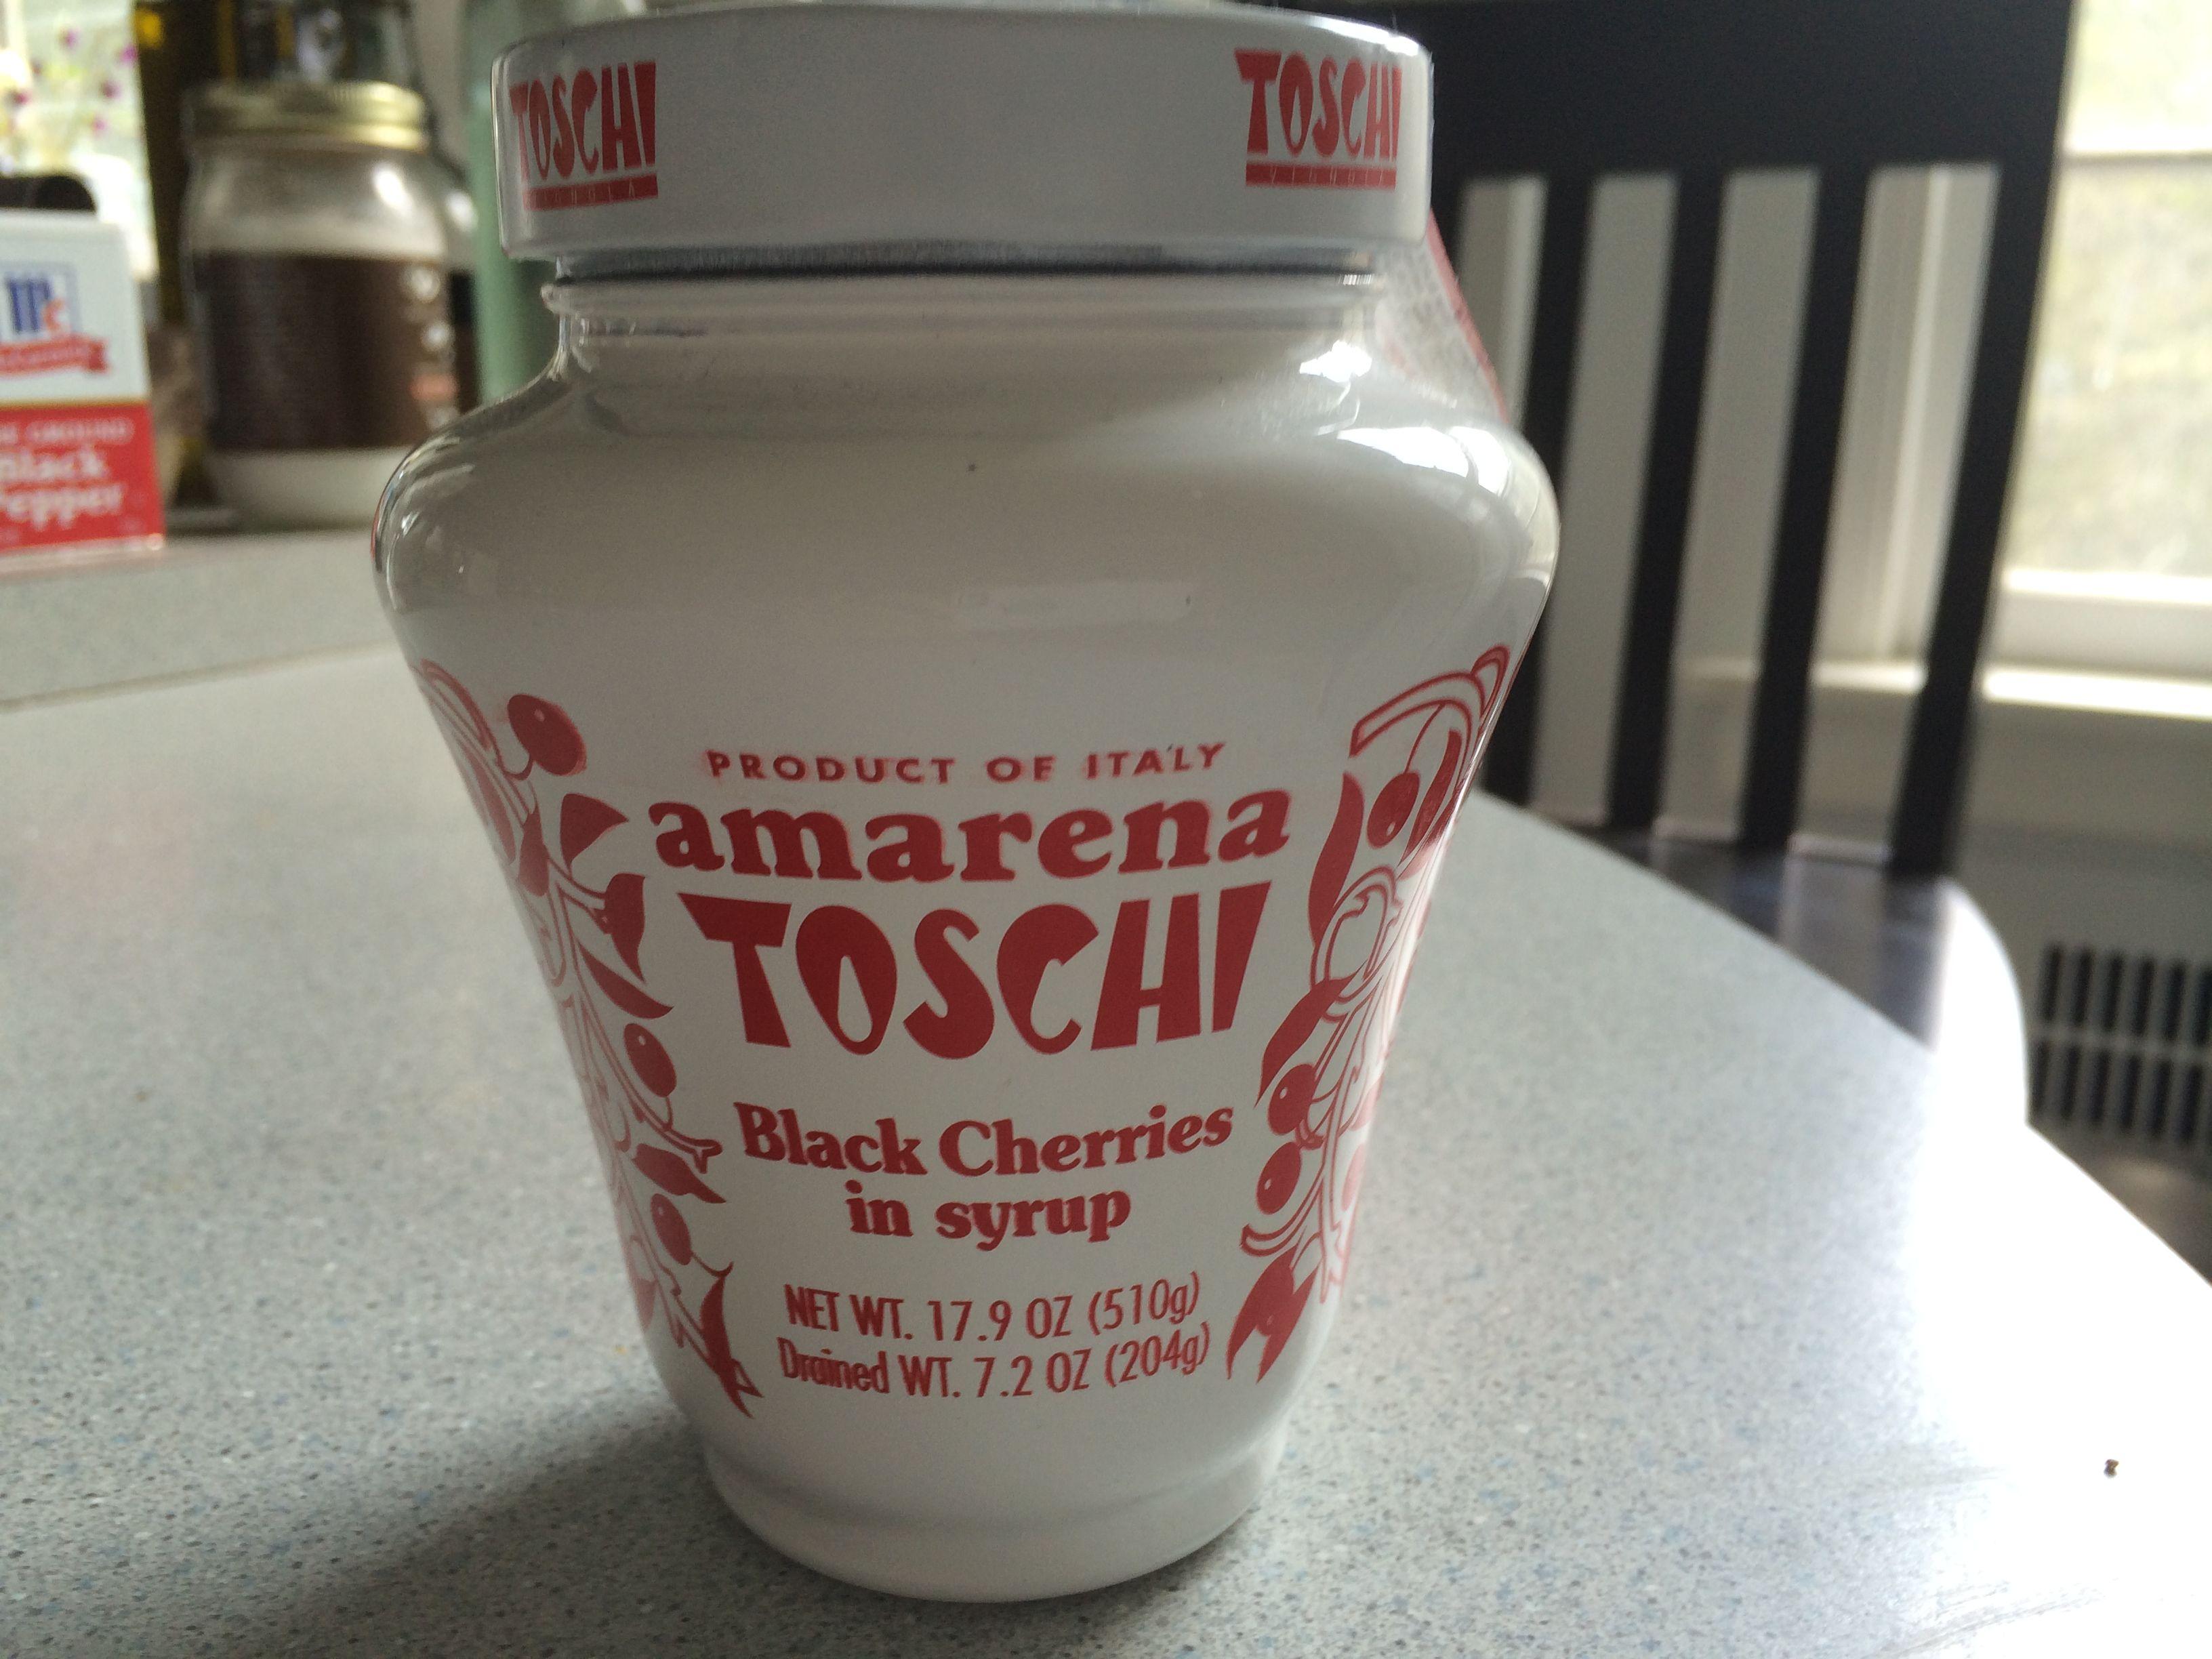 Expensive but worth itespecially over vanilla ice cream